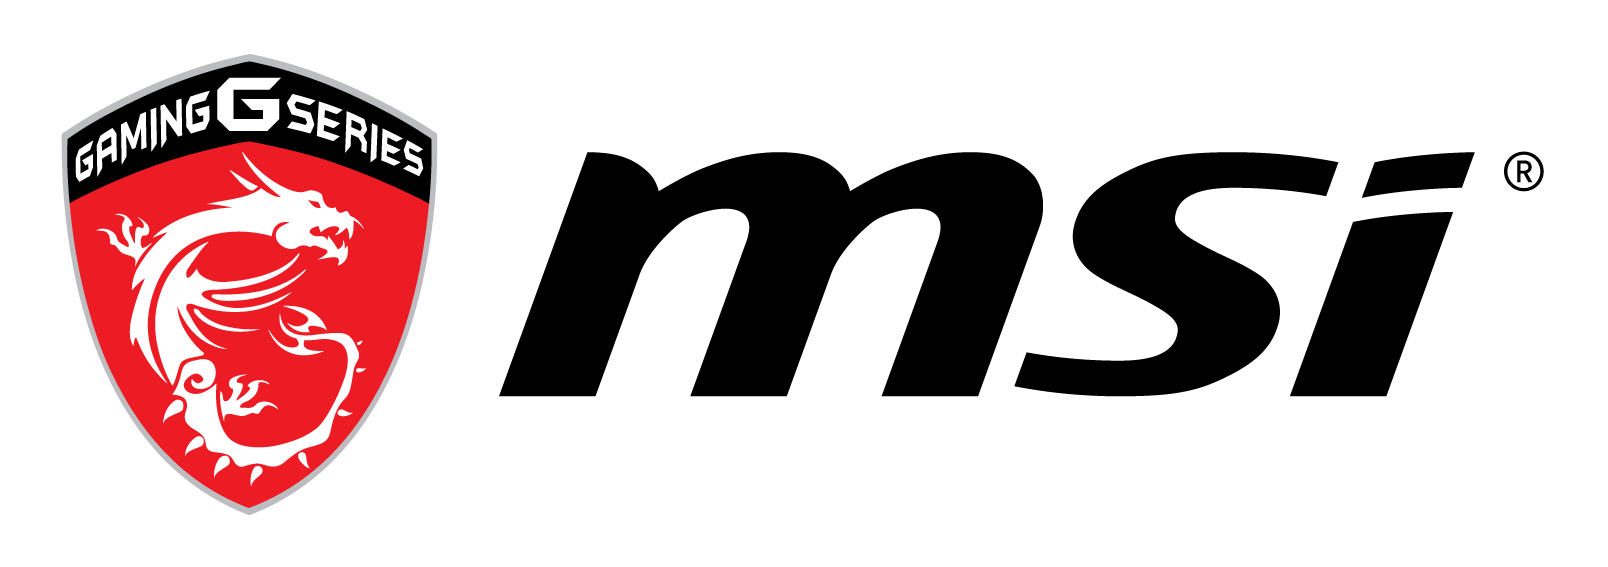 Msi Gaming Logo Google Search Realidad Virtual Descargar Fondo De Pantalla